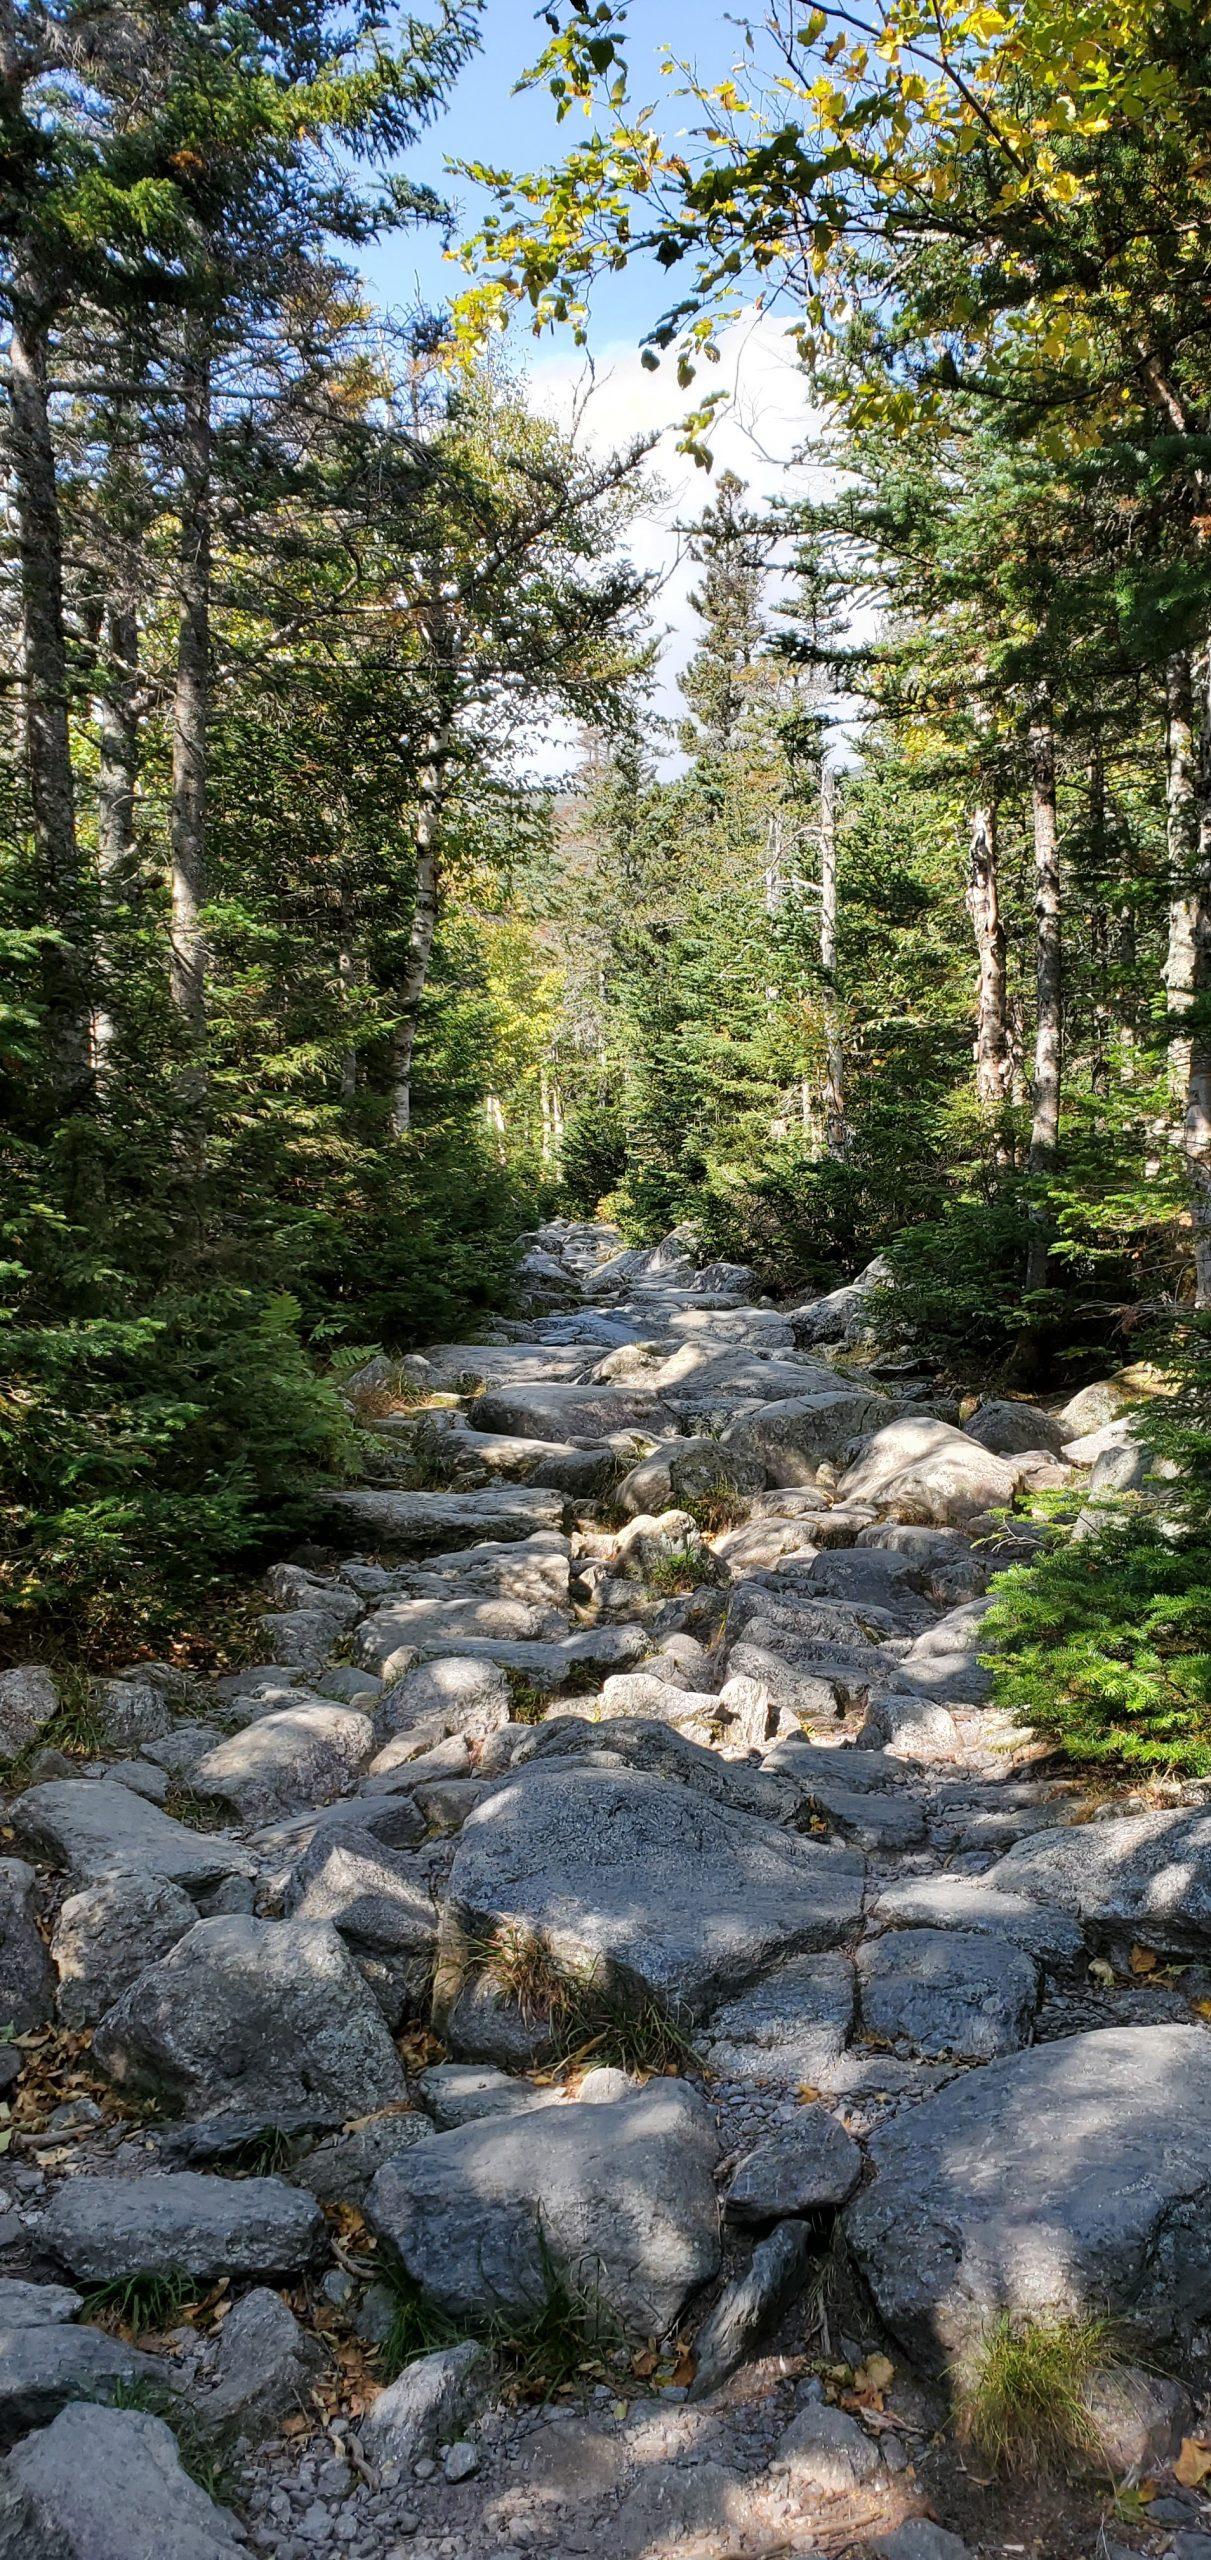 hiking rocks